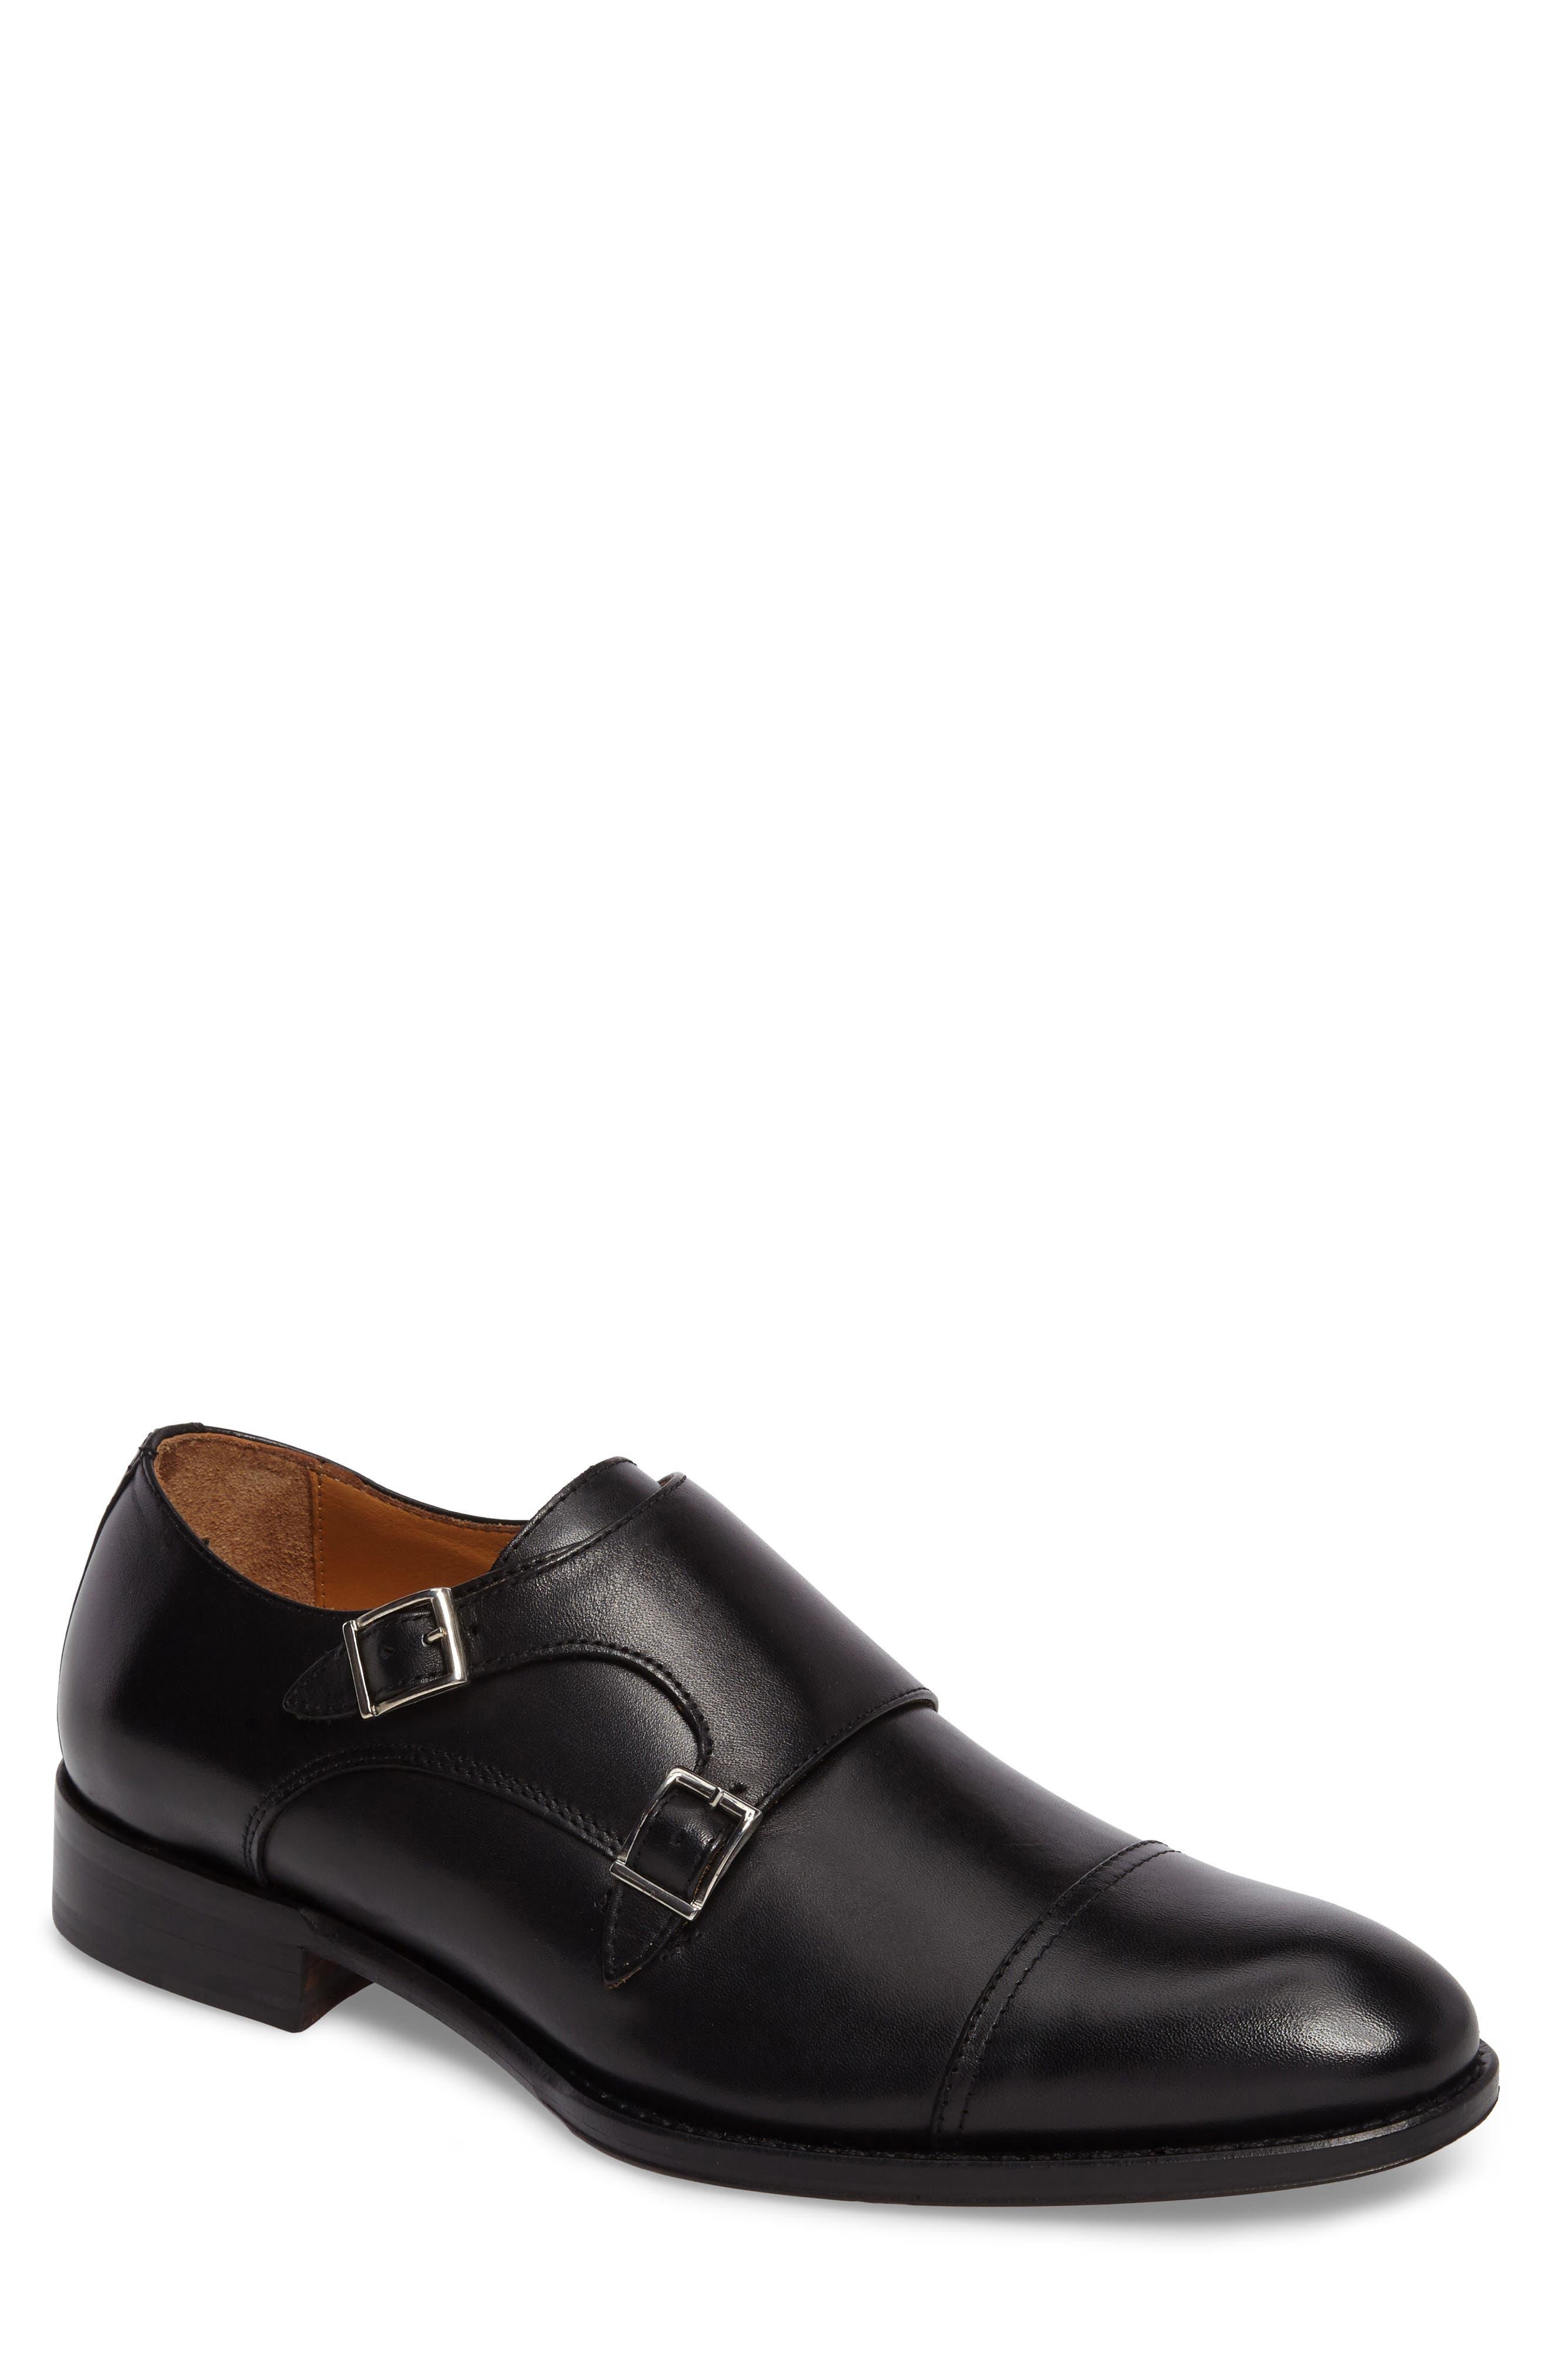 Alternate Image 1 Selected - John W. Nordstrom® Stratton Double Monk Strap Shoe (Men)